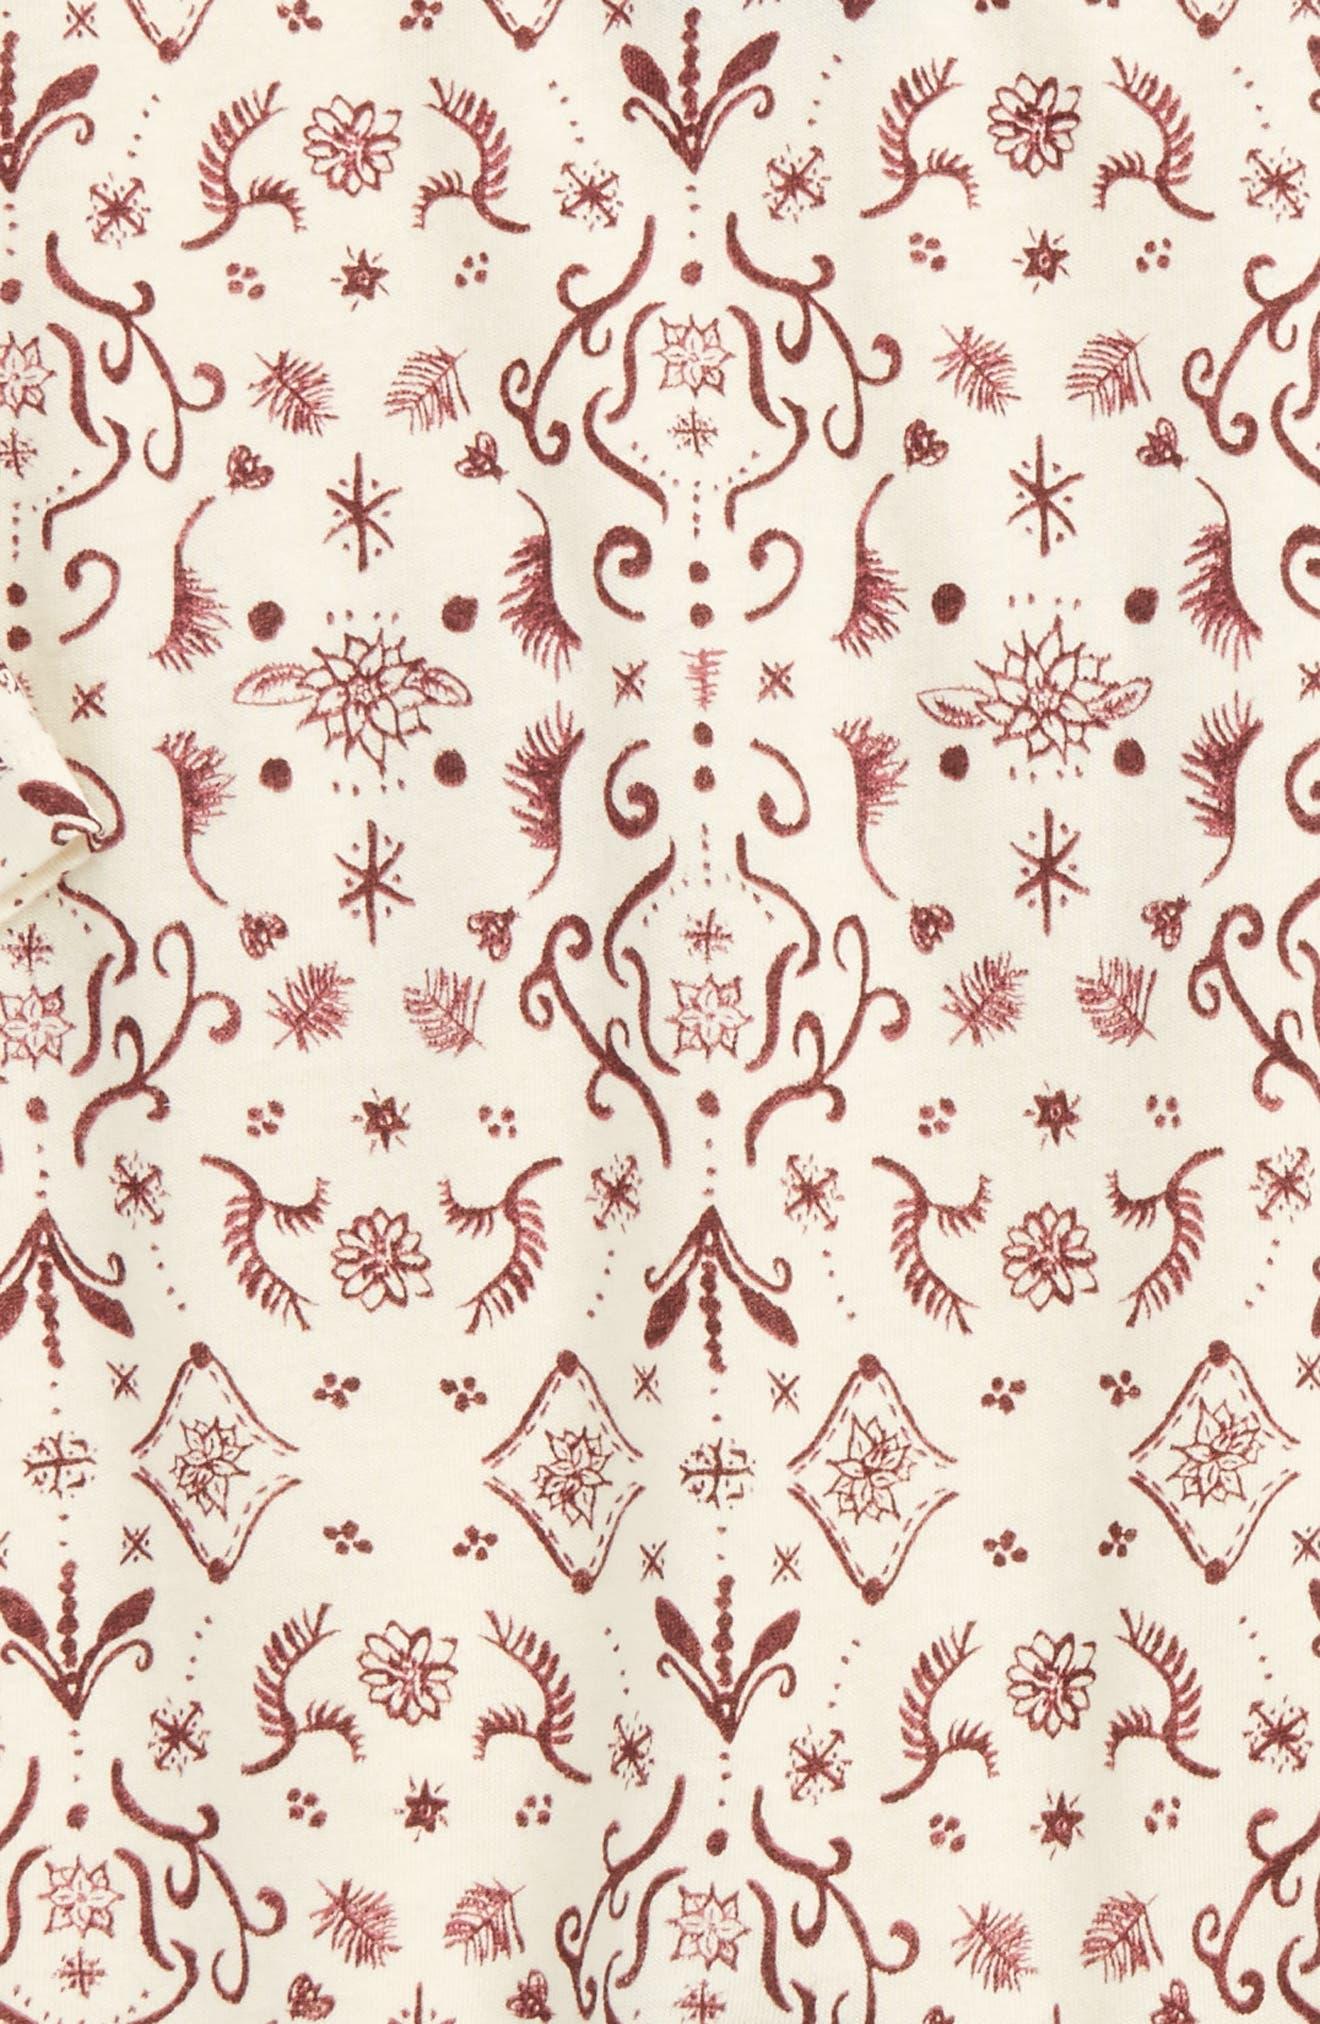 Damask Print Organic Cotton Romper,                             Alternate thumbnail 3, color,                             504